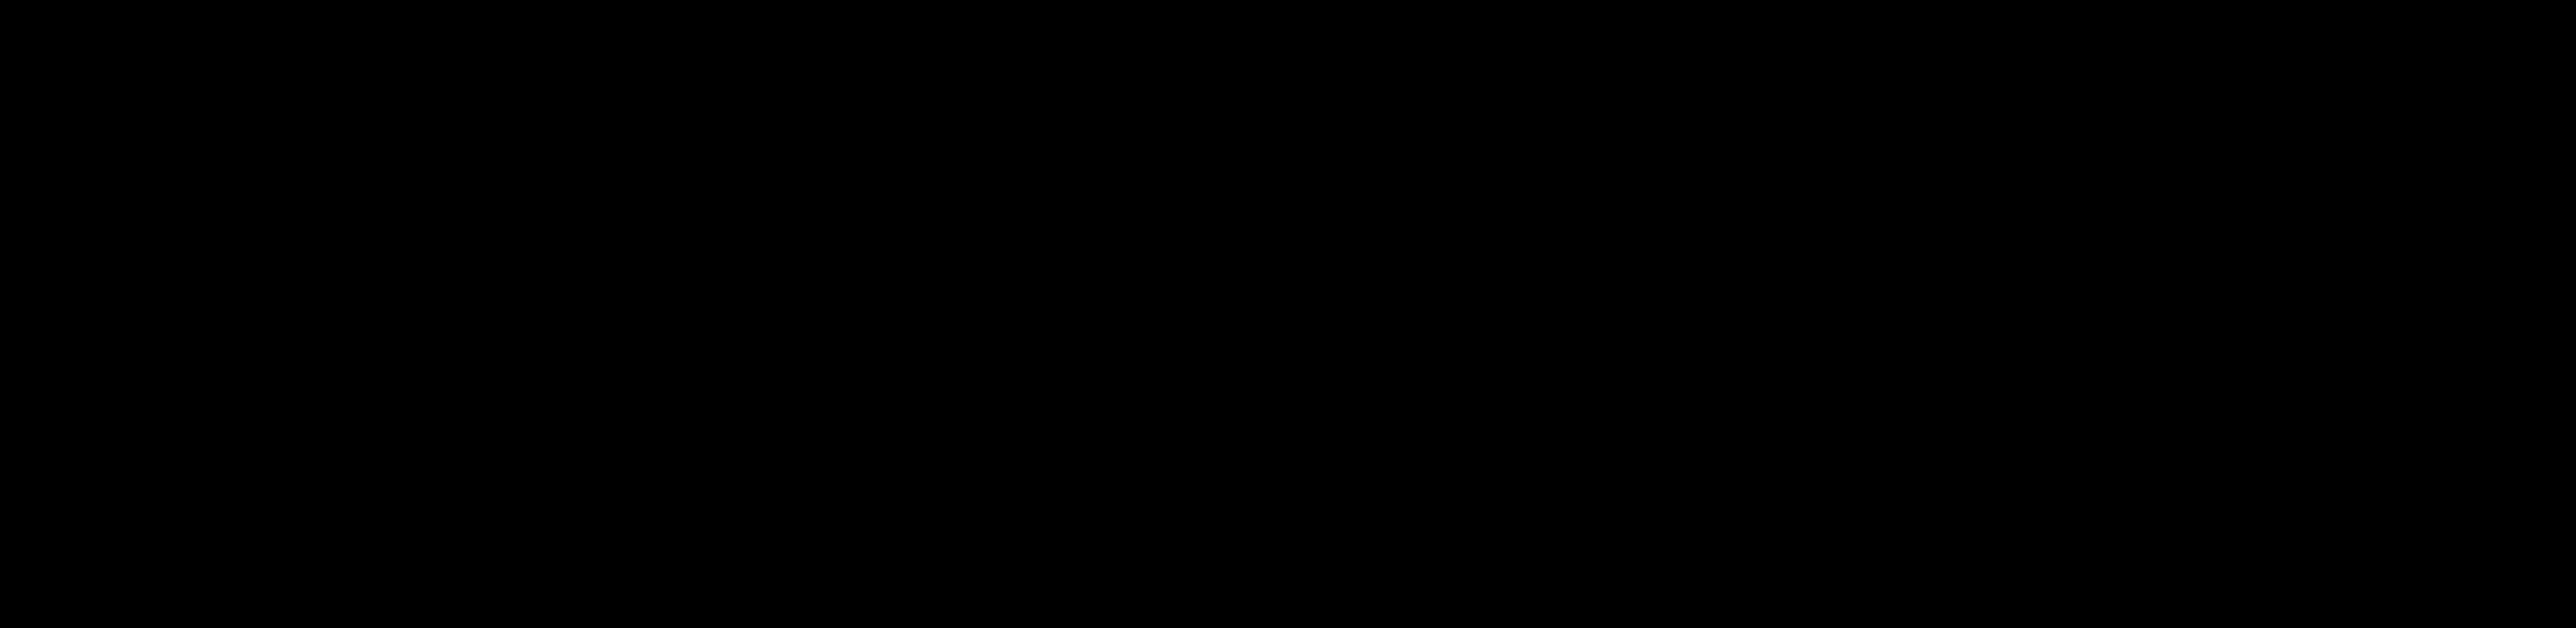 black arrow sign